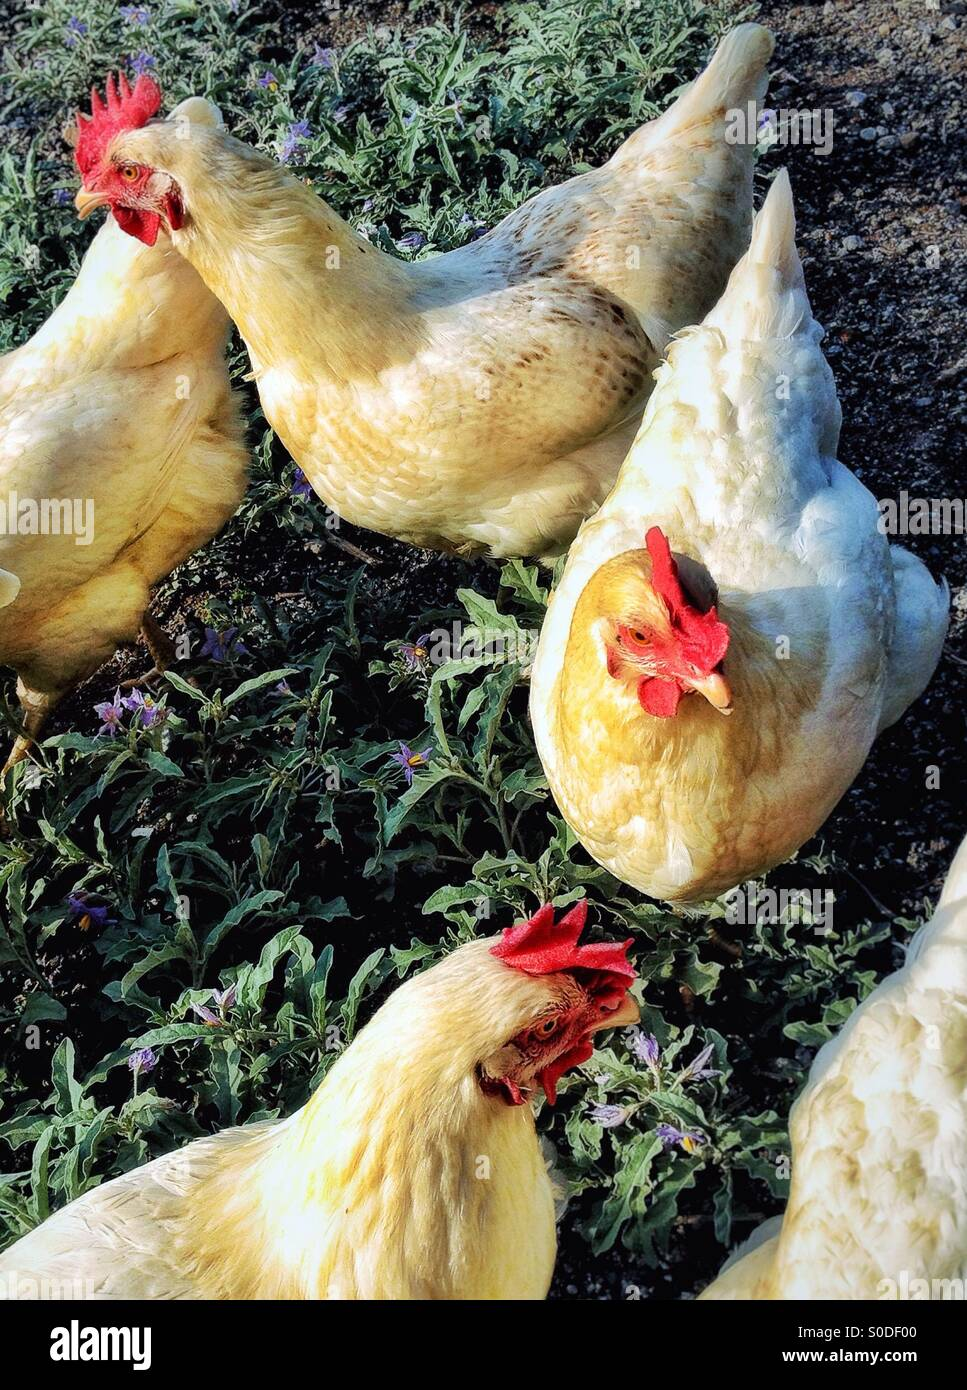 Hens in Yard - Stock Image